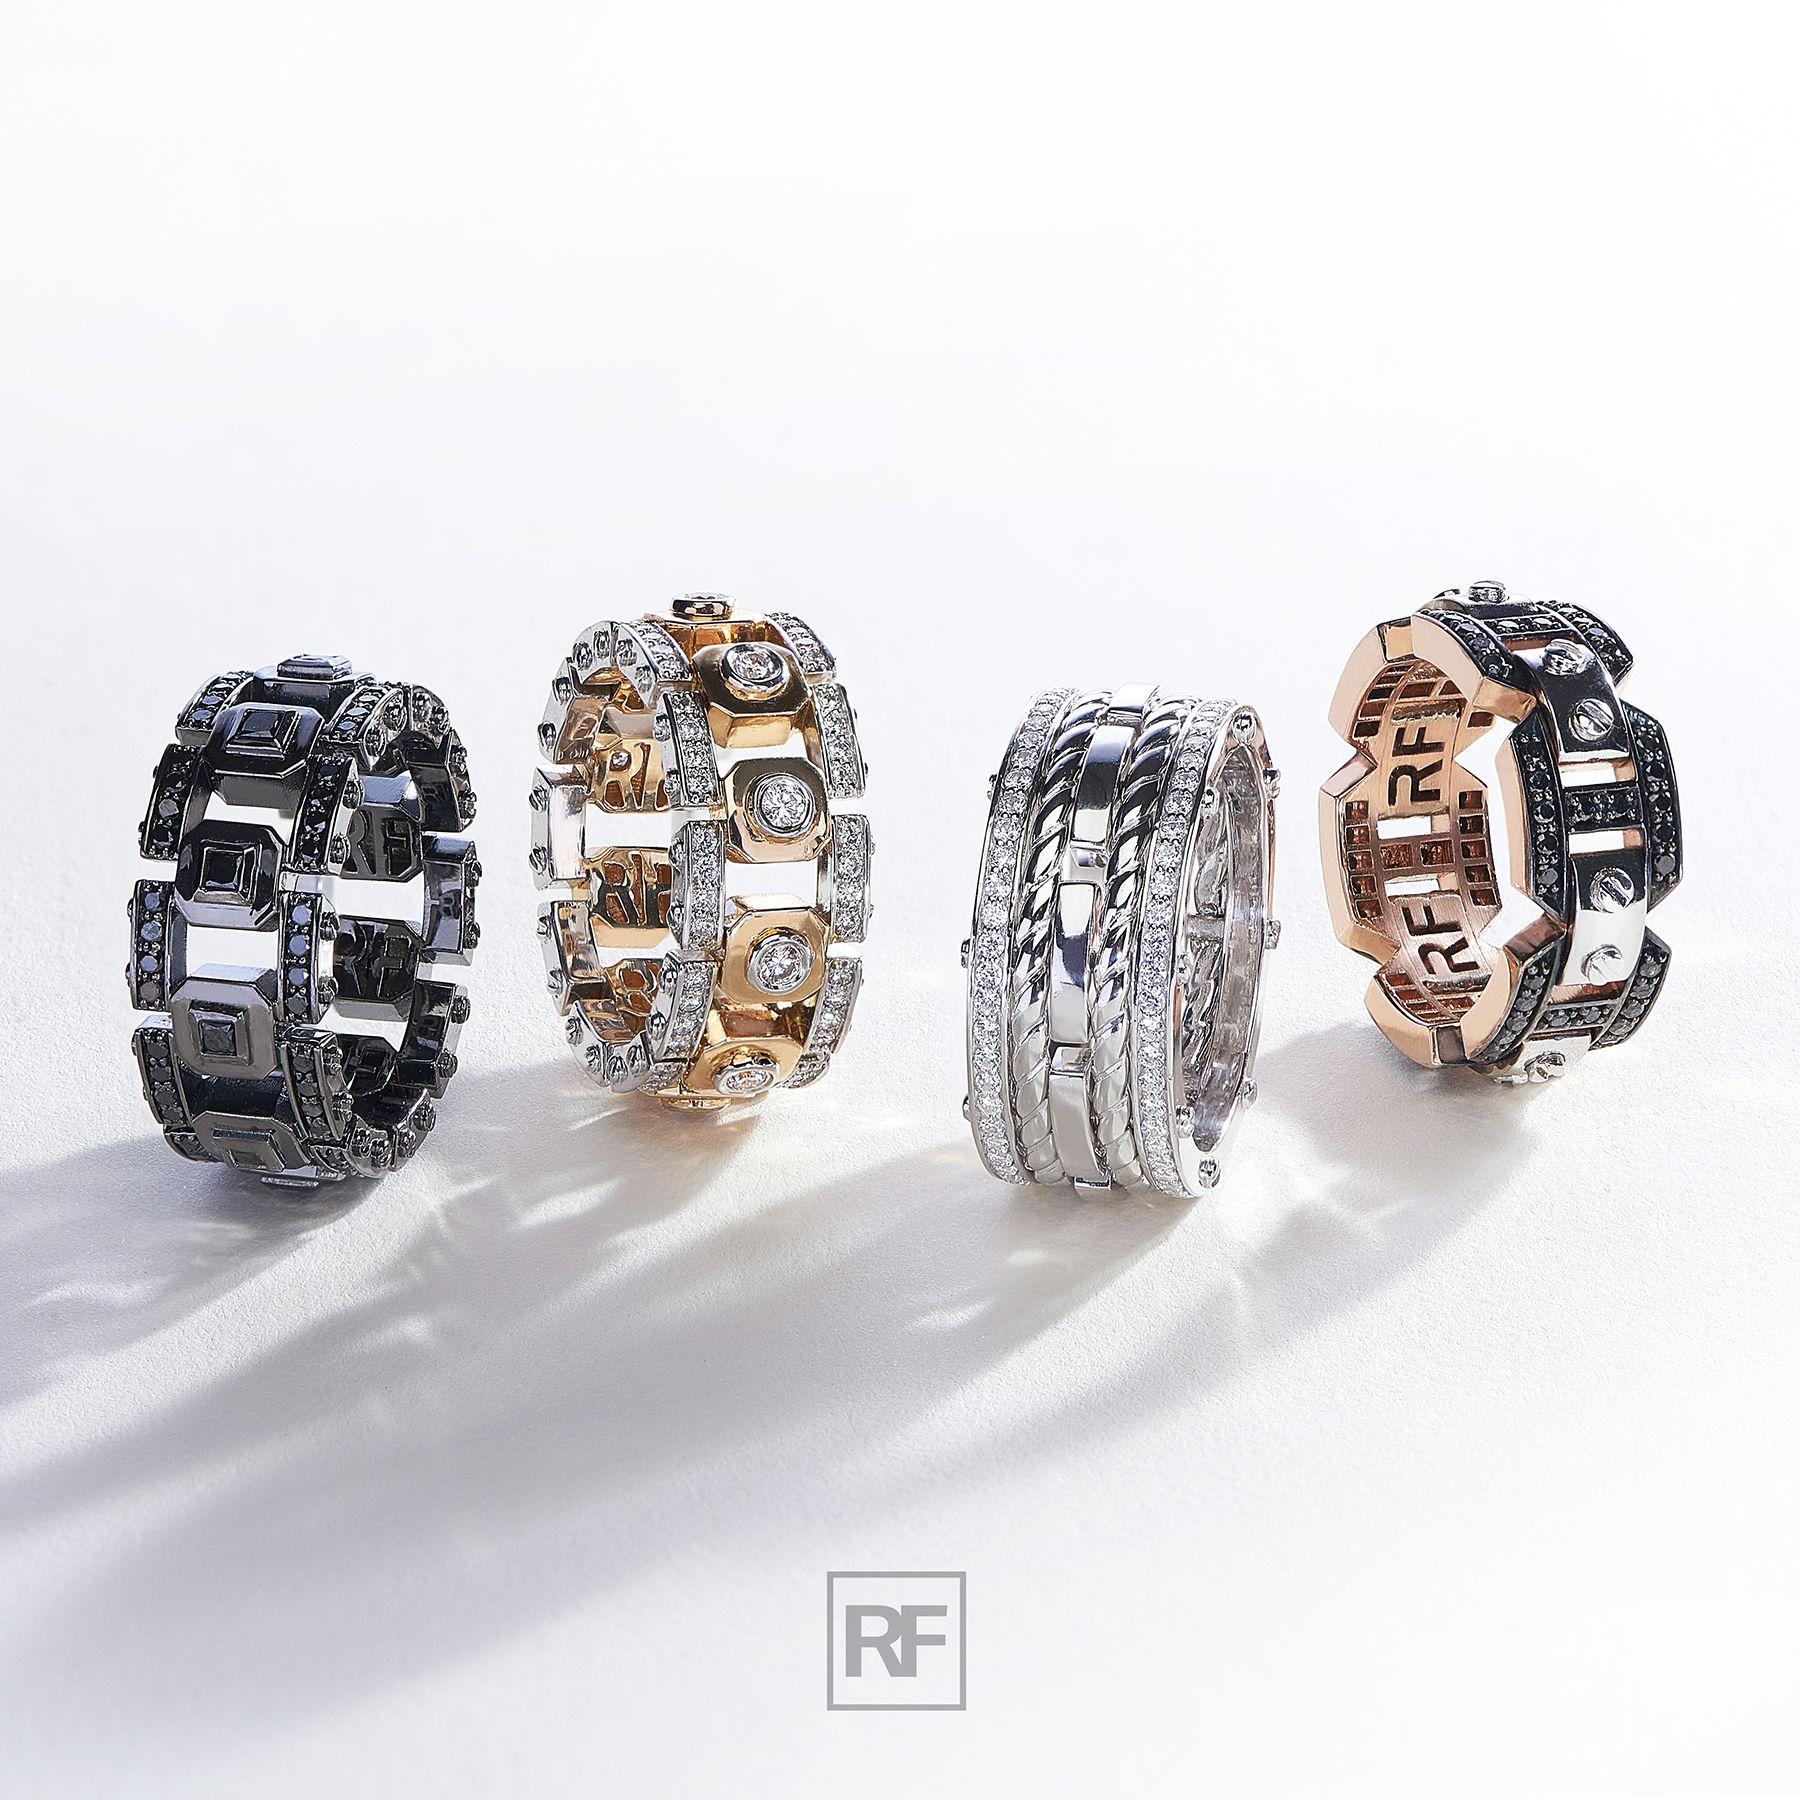 1 Unique Men S Wedding Ring Brand In Us Mens Wedding Bands Designer Mens Wedding Bands Womens Engagement Rings